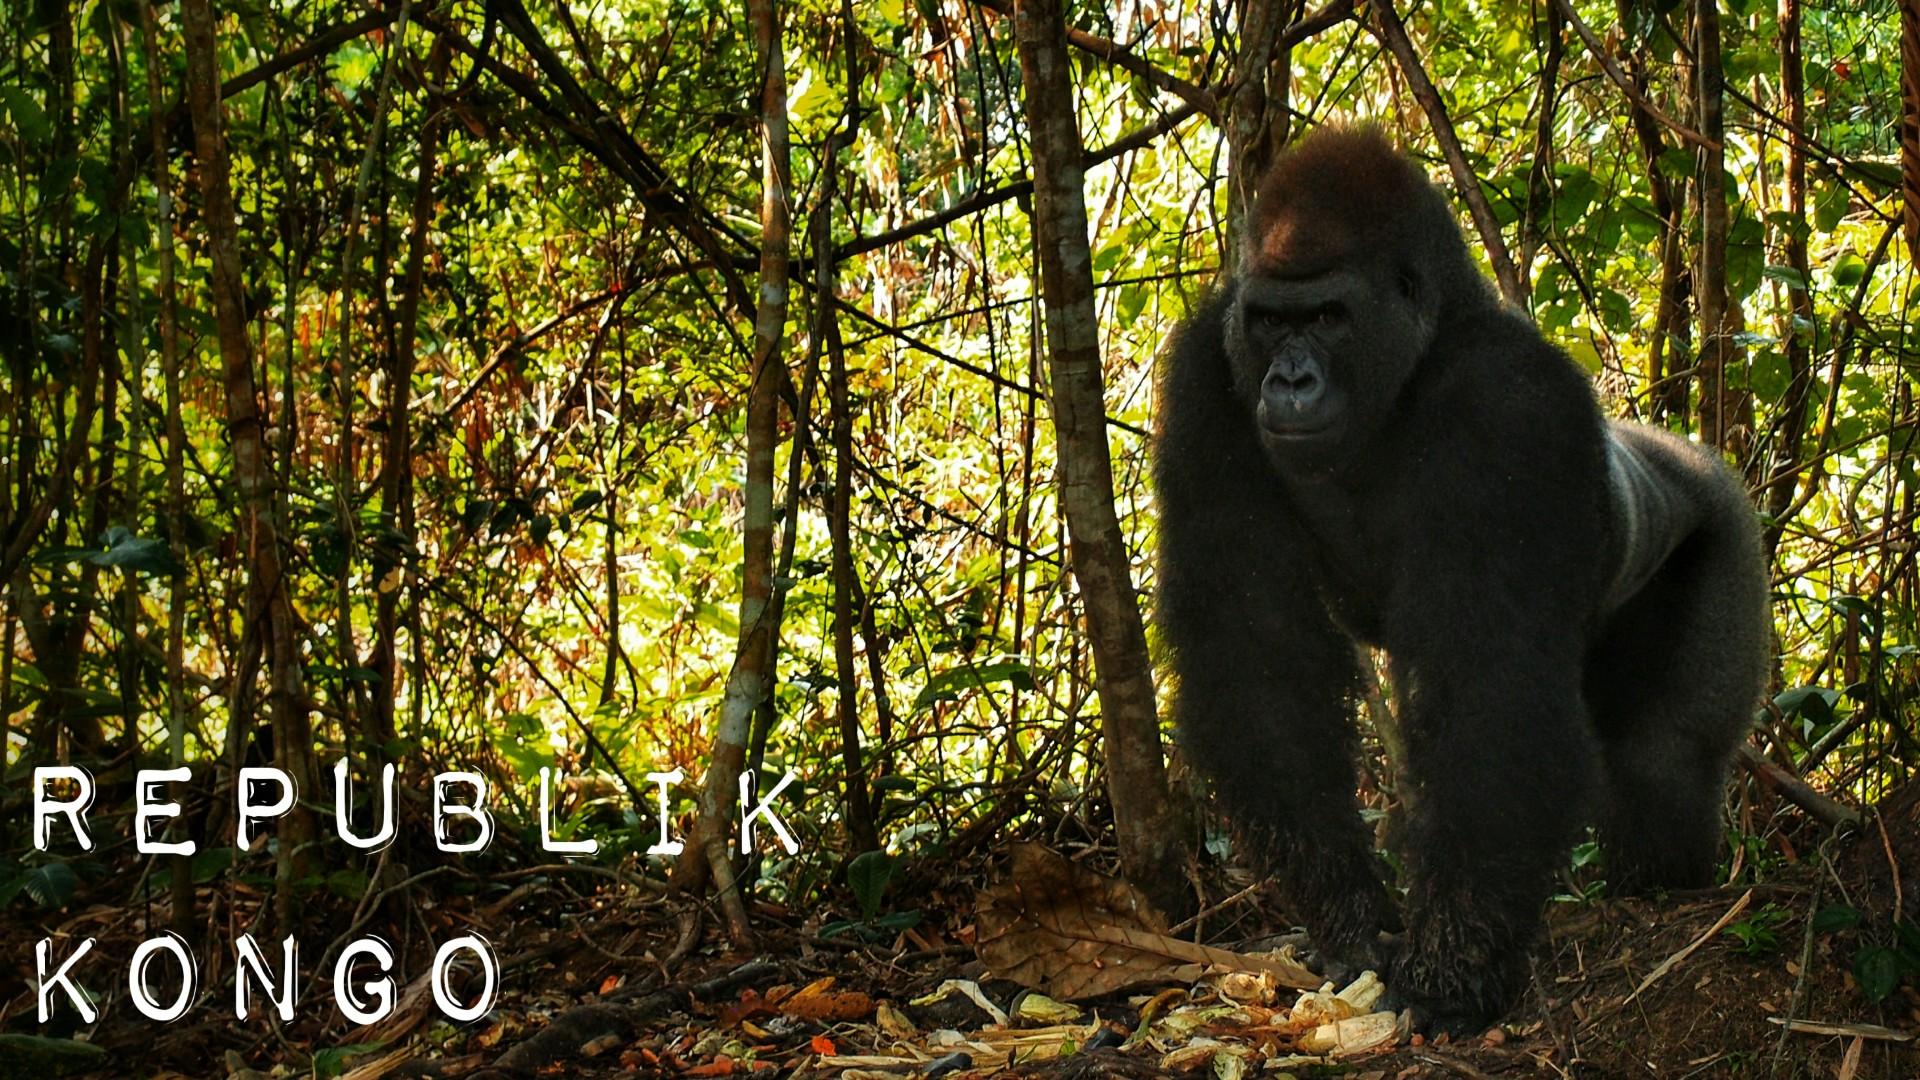 Republik Kongo – Affen gucken